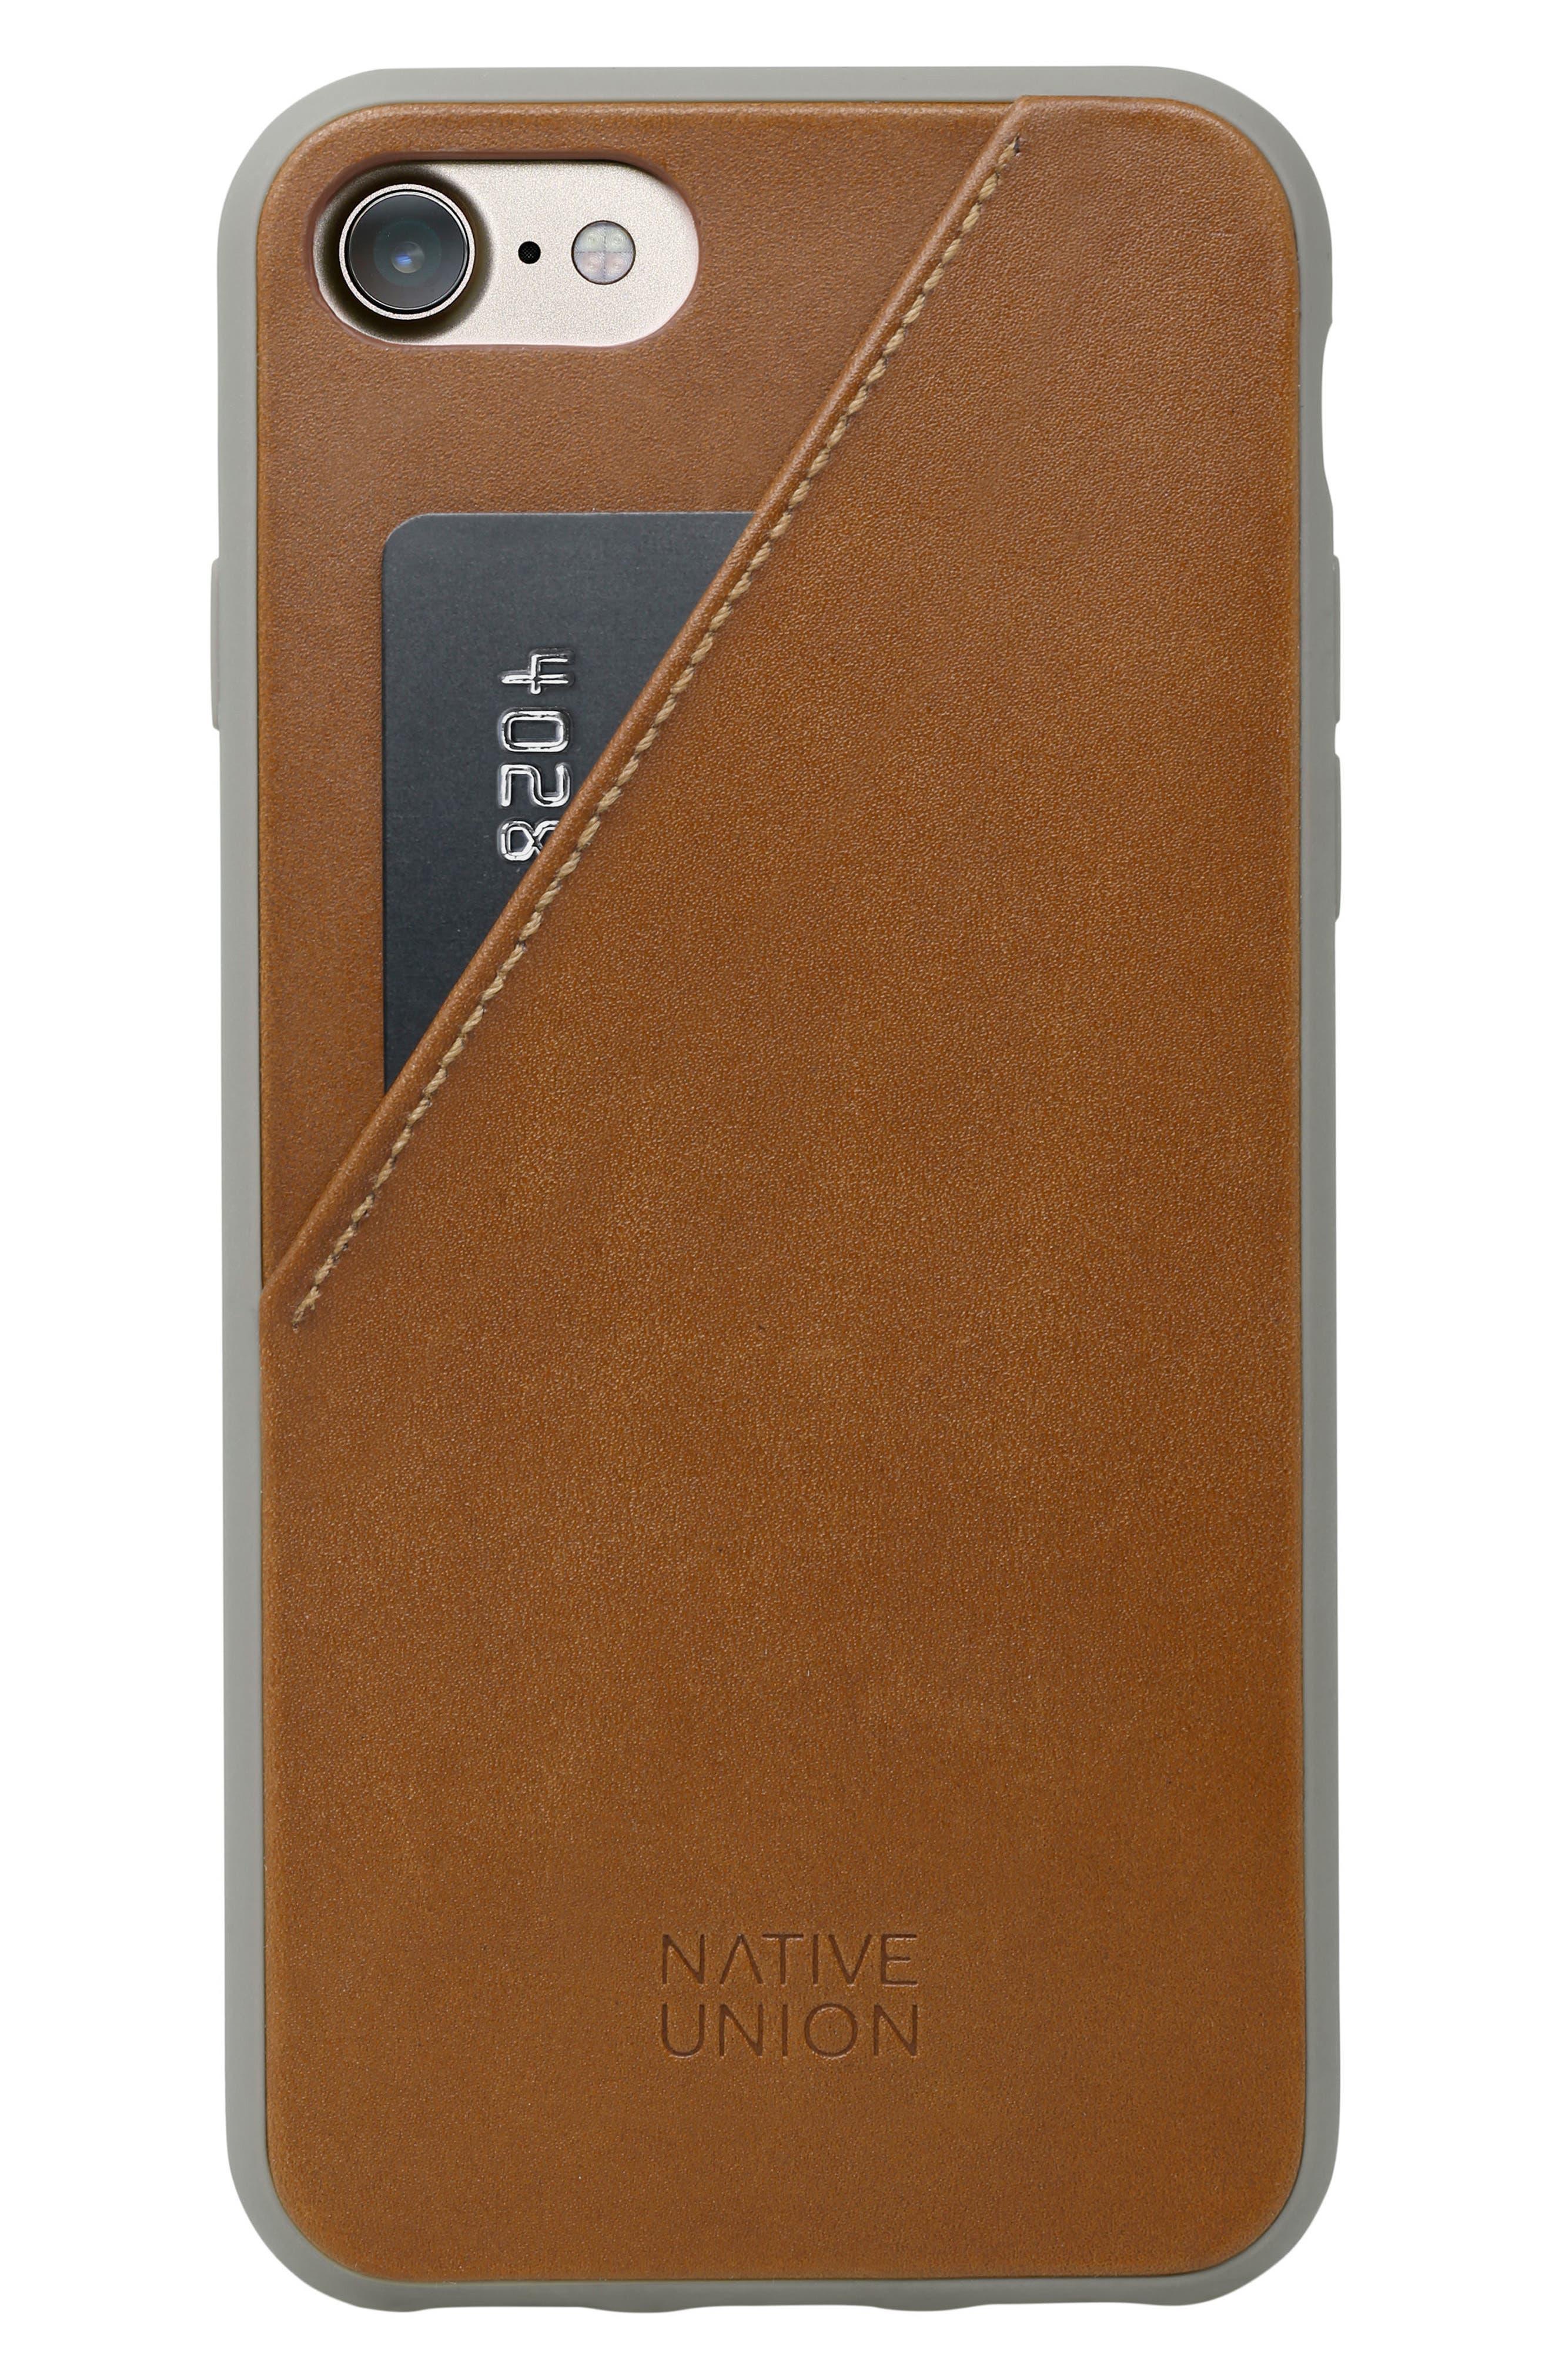 Native Union CLIC Card iPhone 7 & 7 Plus Case